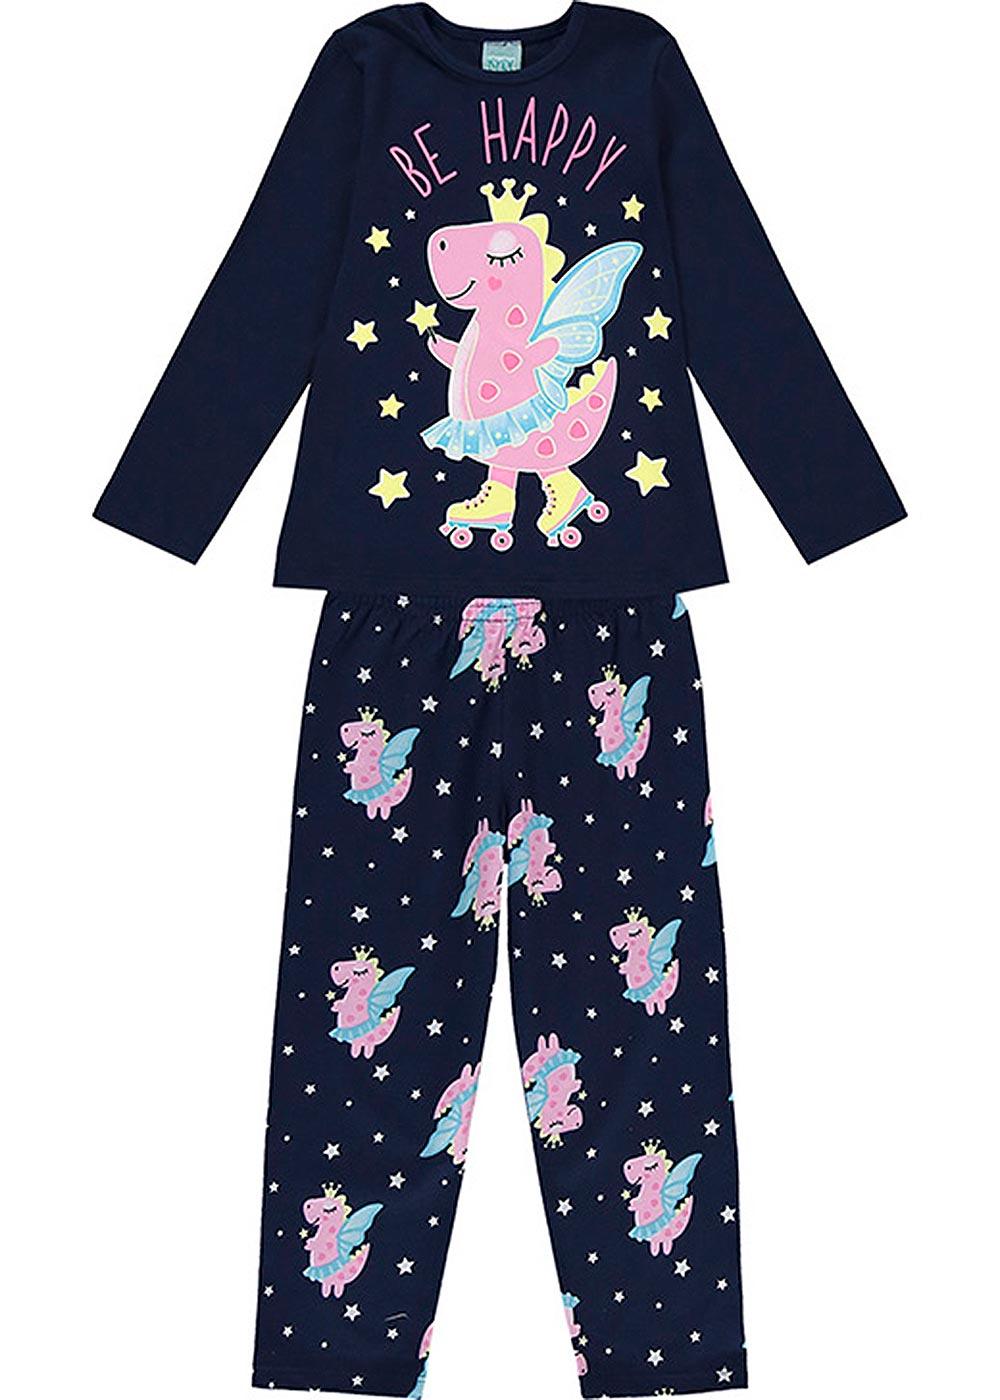 Pijama Infantil Feminino Inverno Marinho Be Happy - Kyly